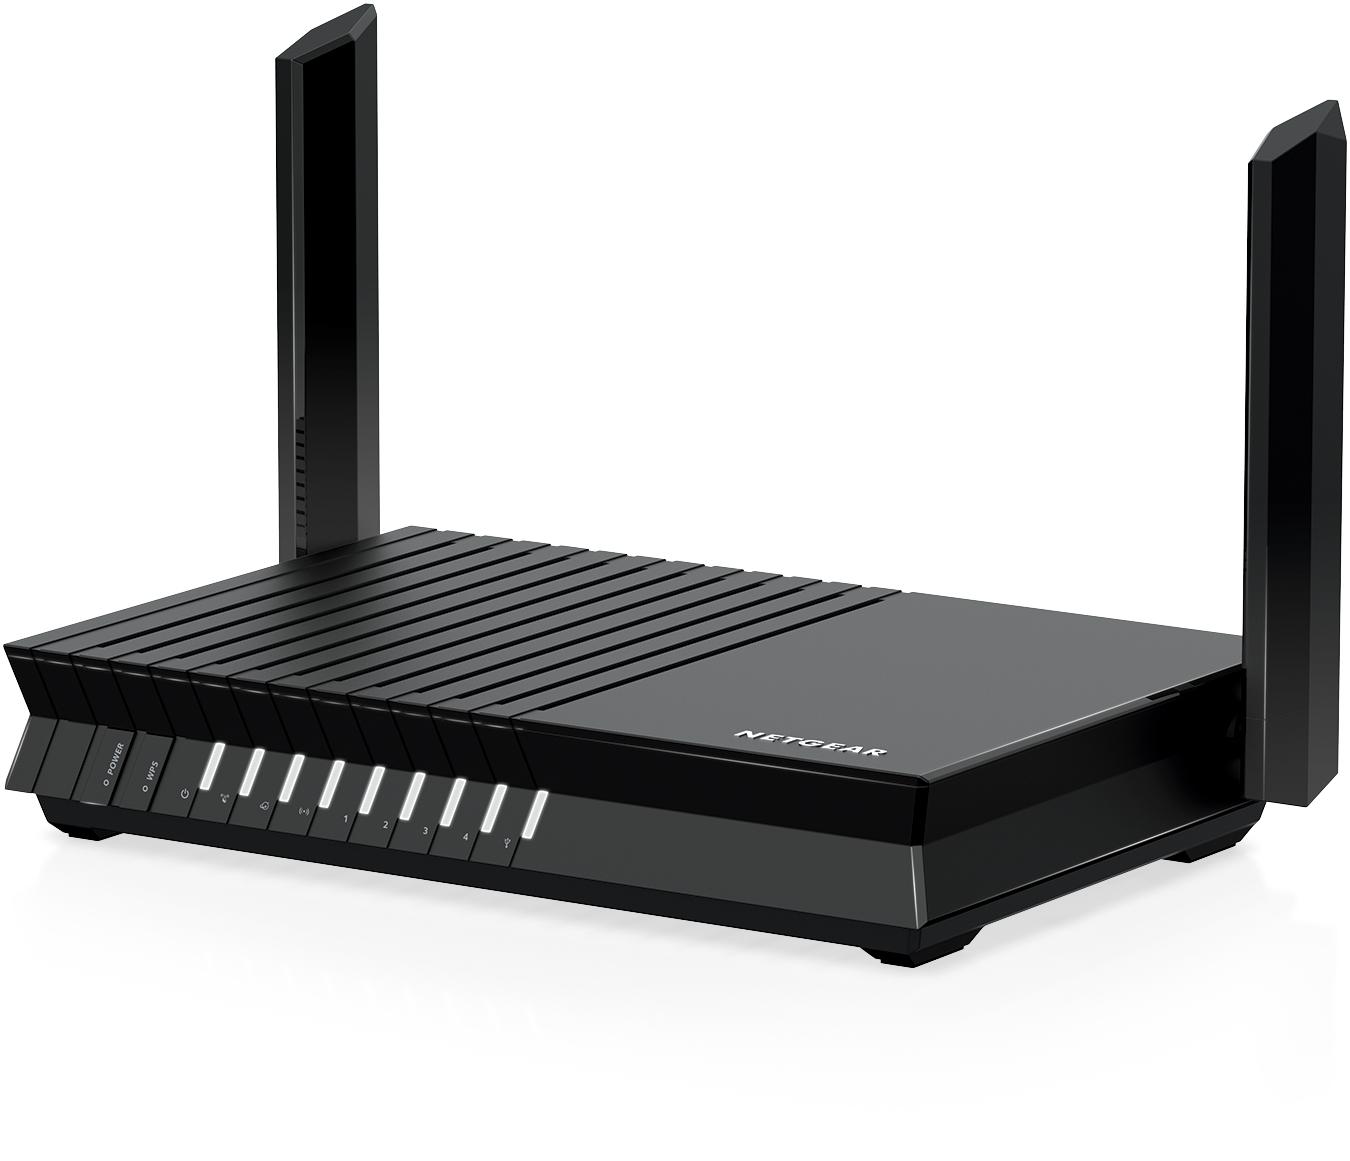 Routeur Netgear WiFi 6 RAX20-100PES - store.Netgear.fr